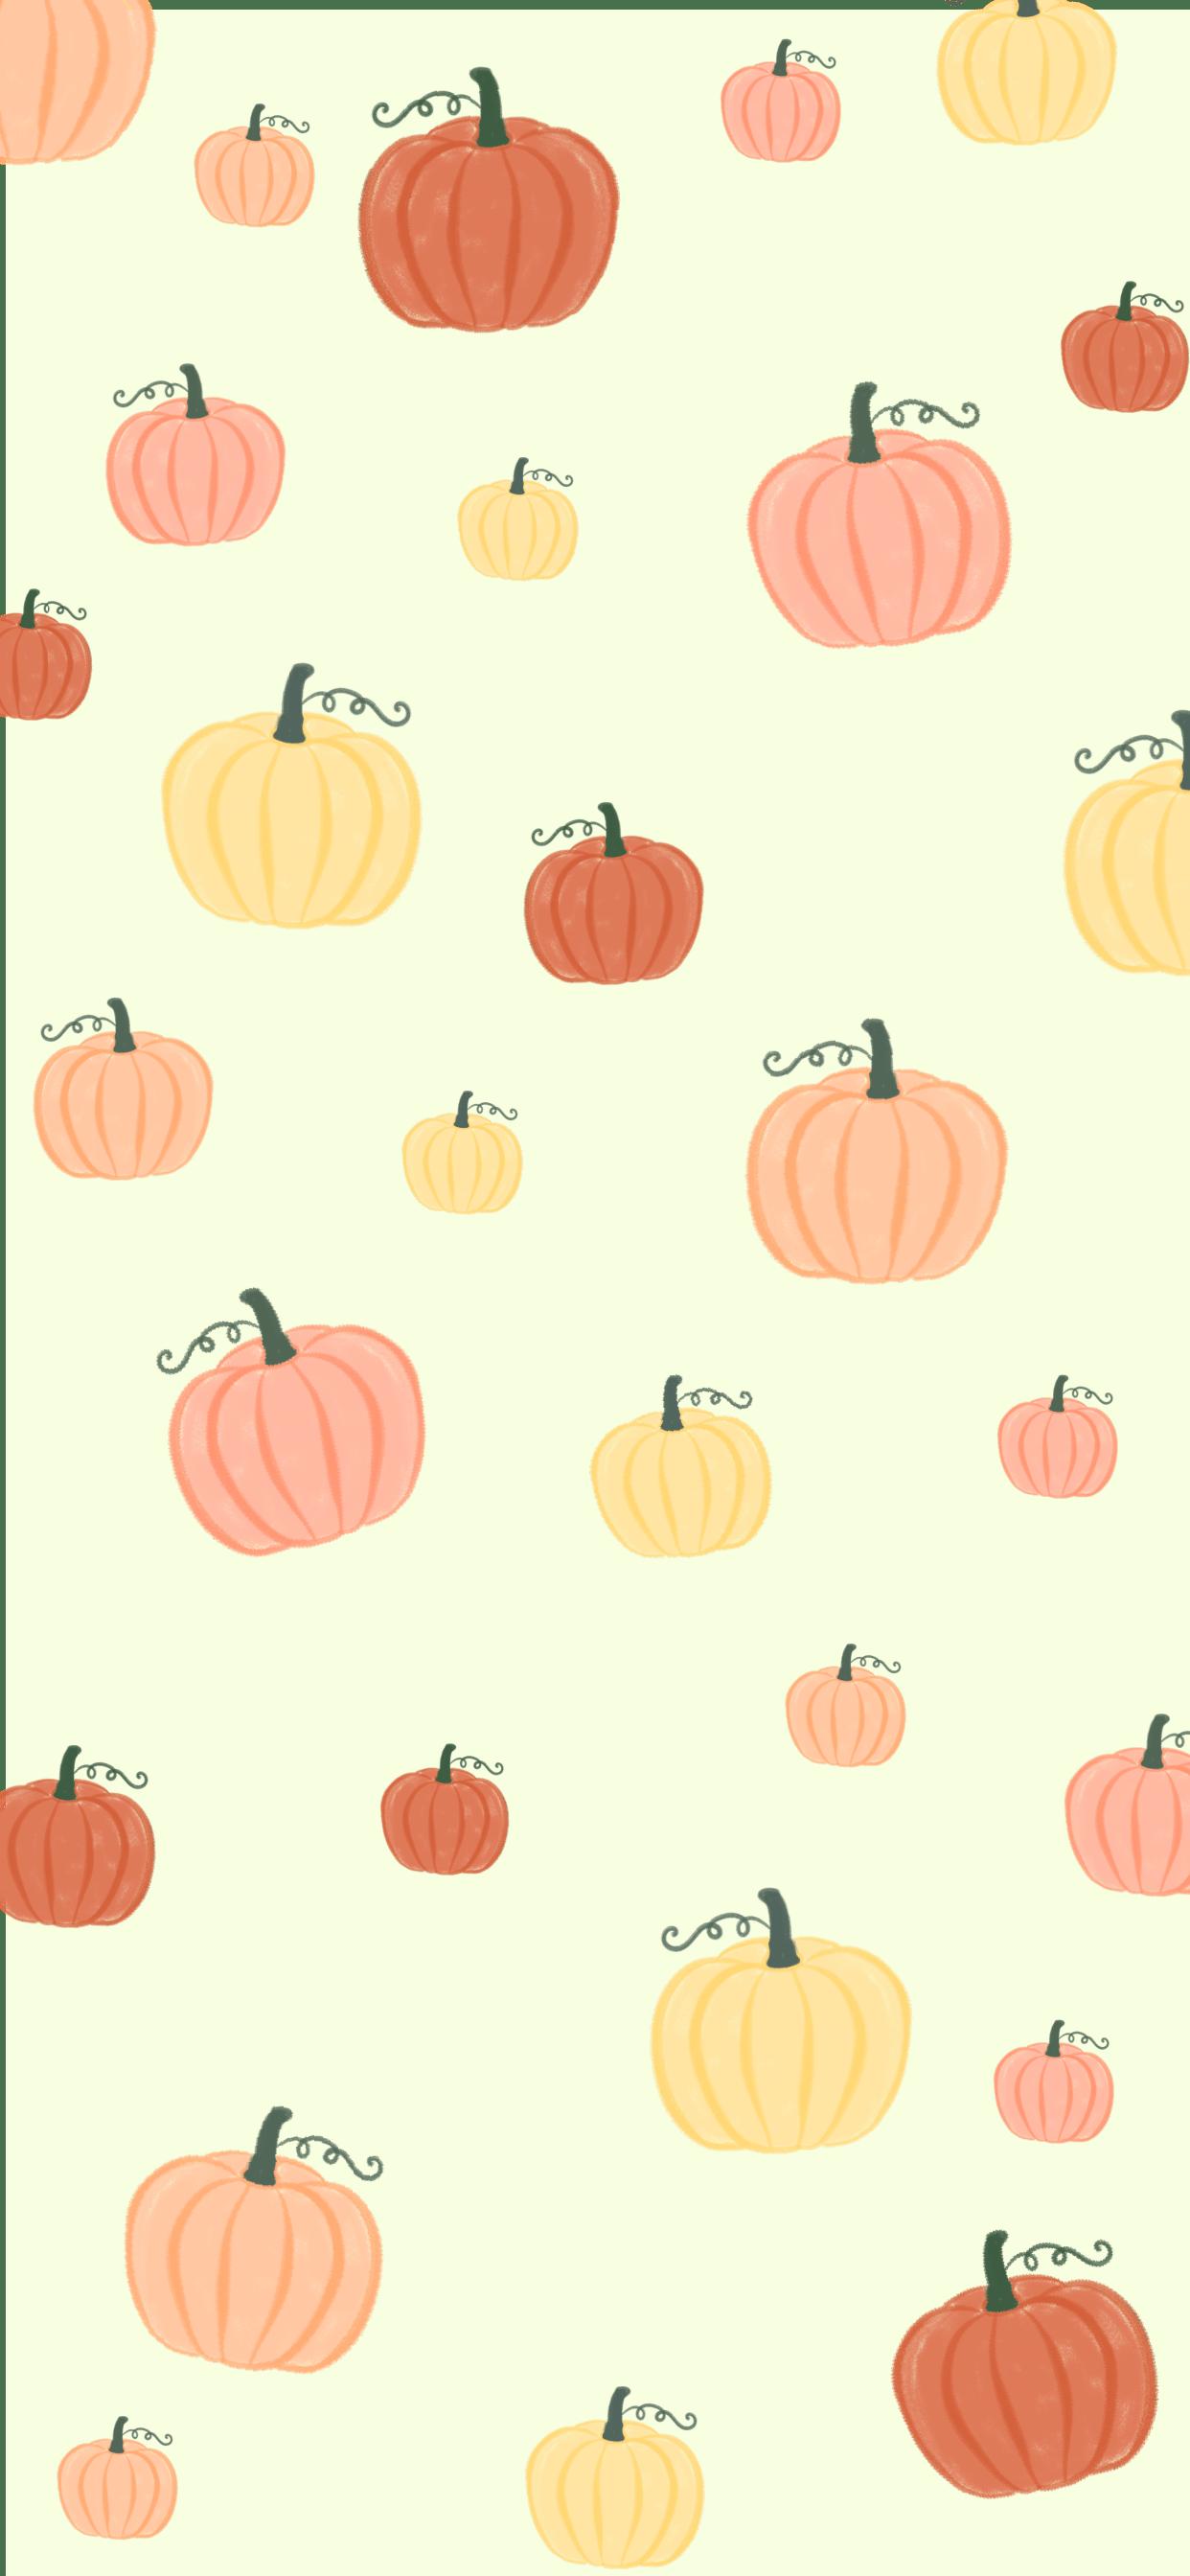 Cute Pumpkin Iphone Wallpapers Top Free Cute Pumpkin Iphone Backgrounds Wallpaperaccess